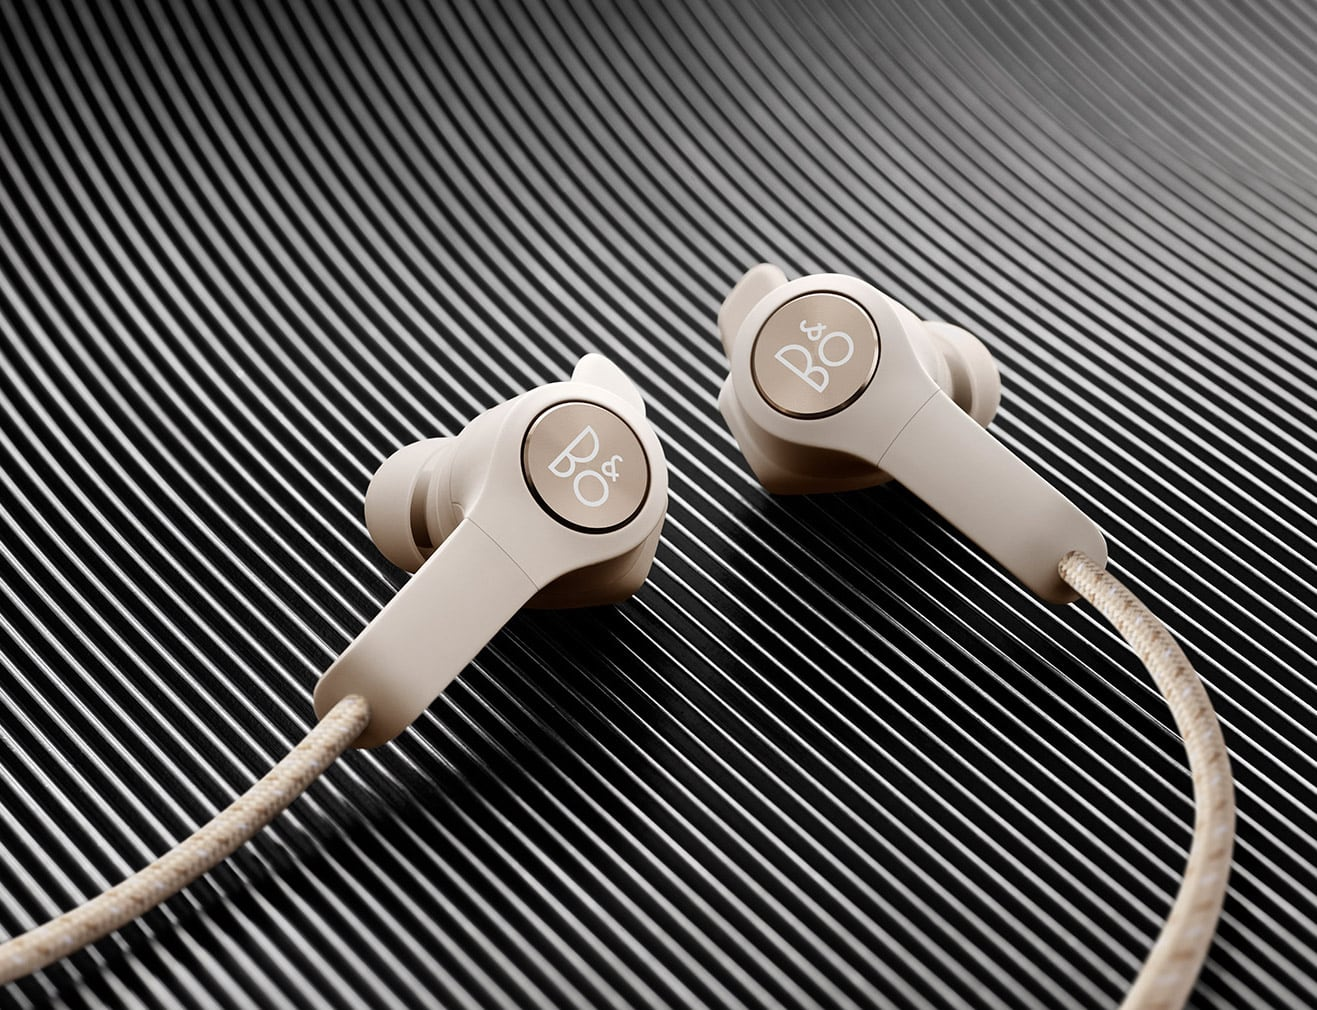 Beoplay E6 Lightweight Wireless Earphones